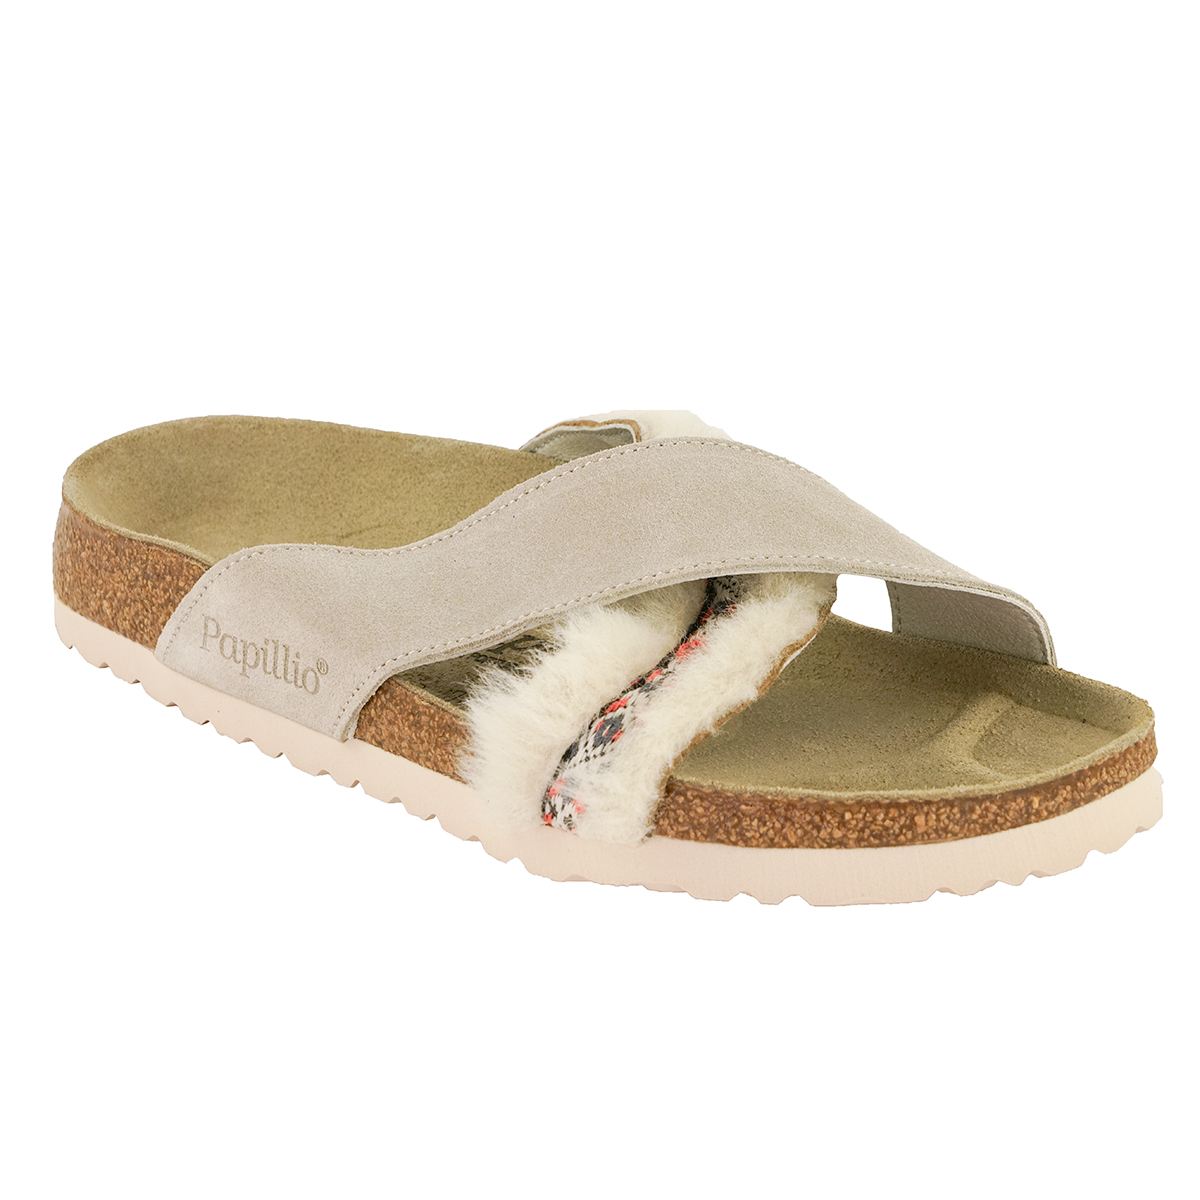 Birkenstock-Papillio-Daytona-Suede-Leather-Fur-Sandals